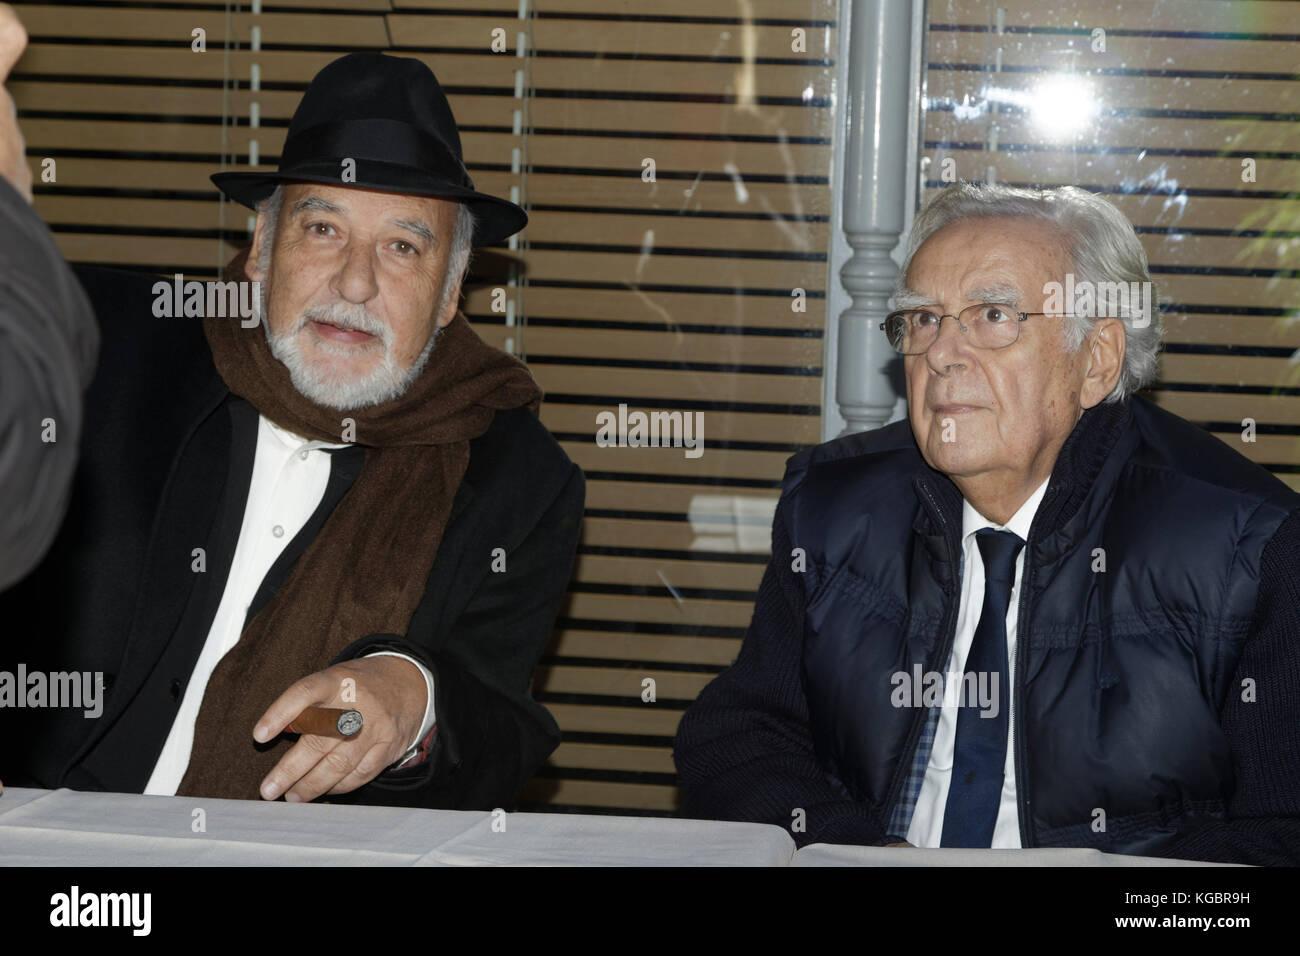 Paris, France. 6th Nov, 2017. Tahar Ben Jelloun and Bernard Pivot attend the Prix Goncourt at the Drouan restaurant - Stock Image